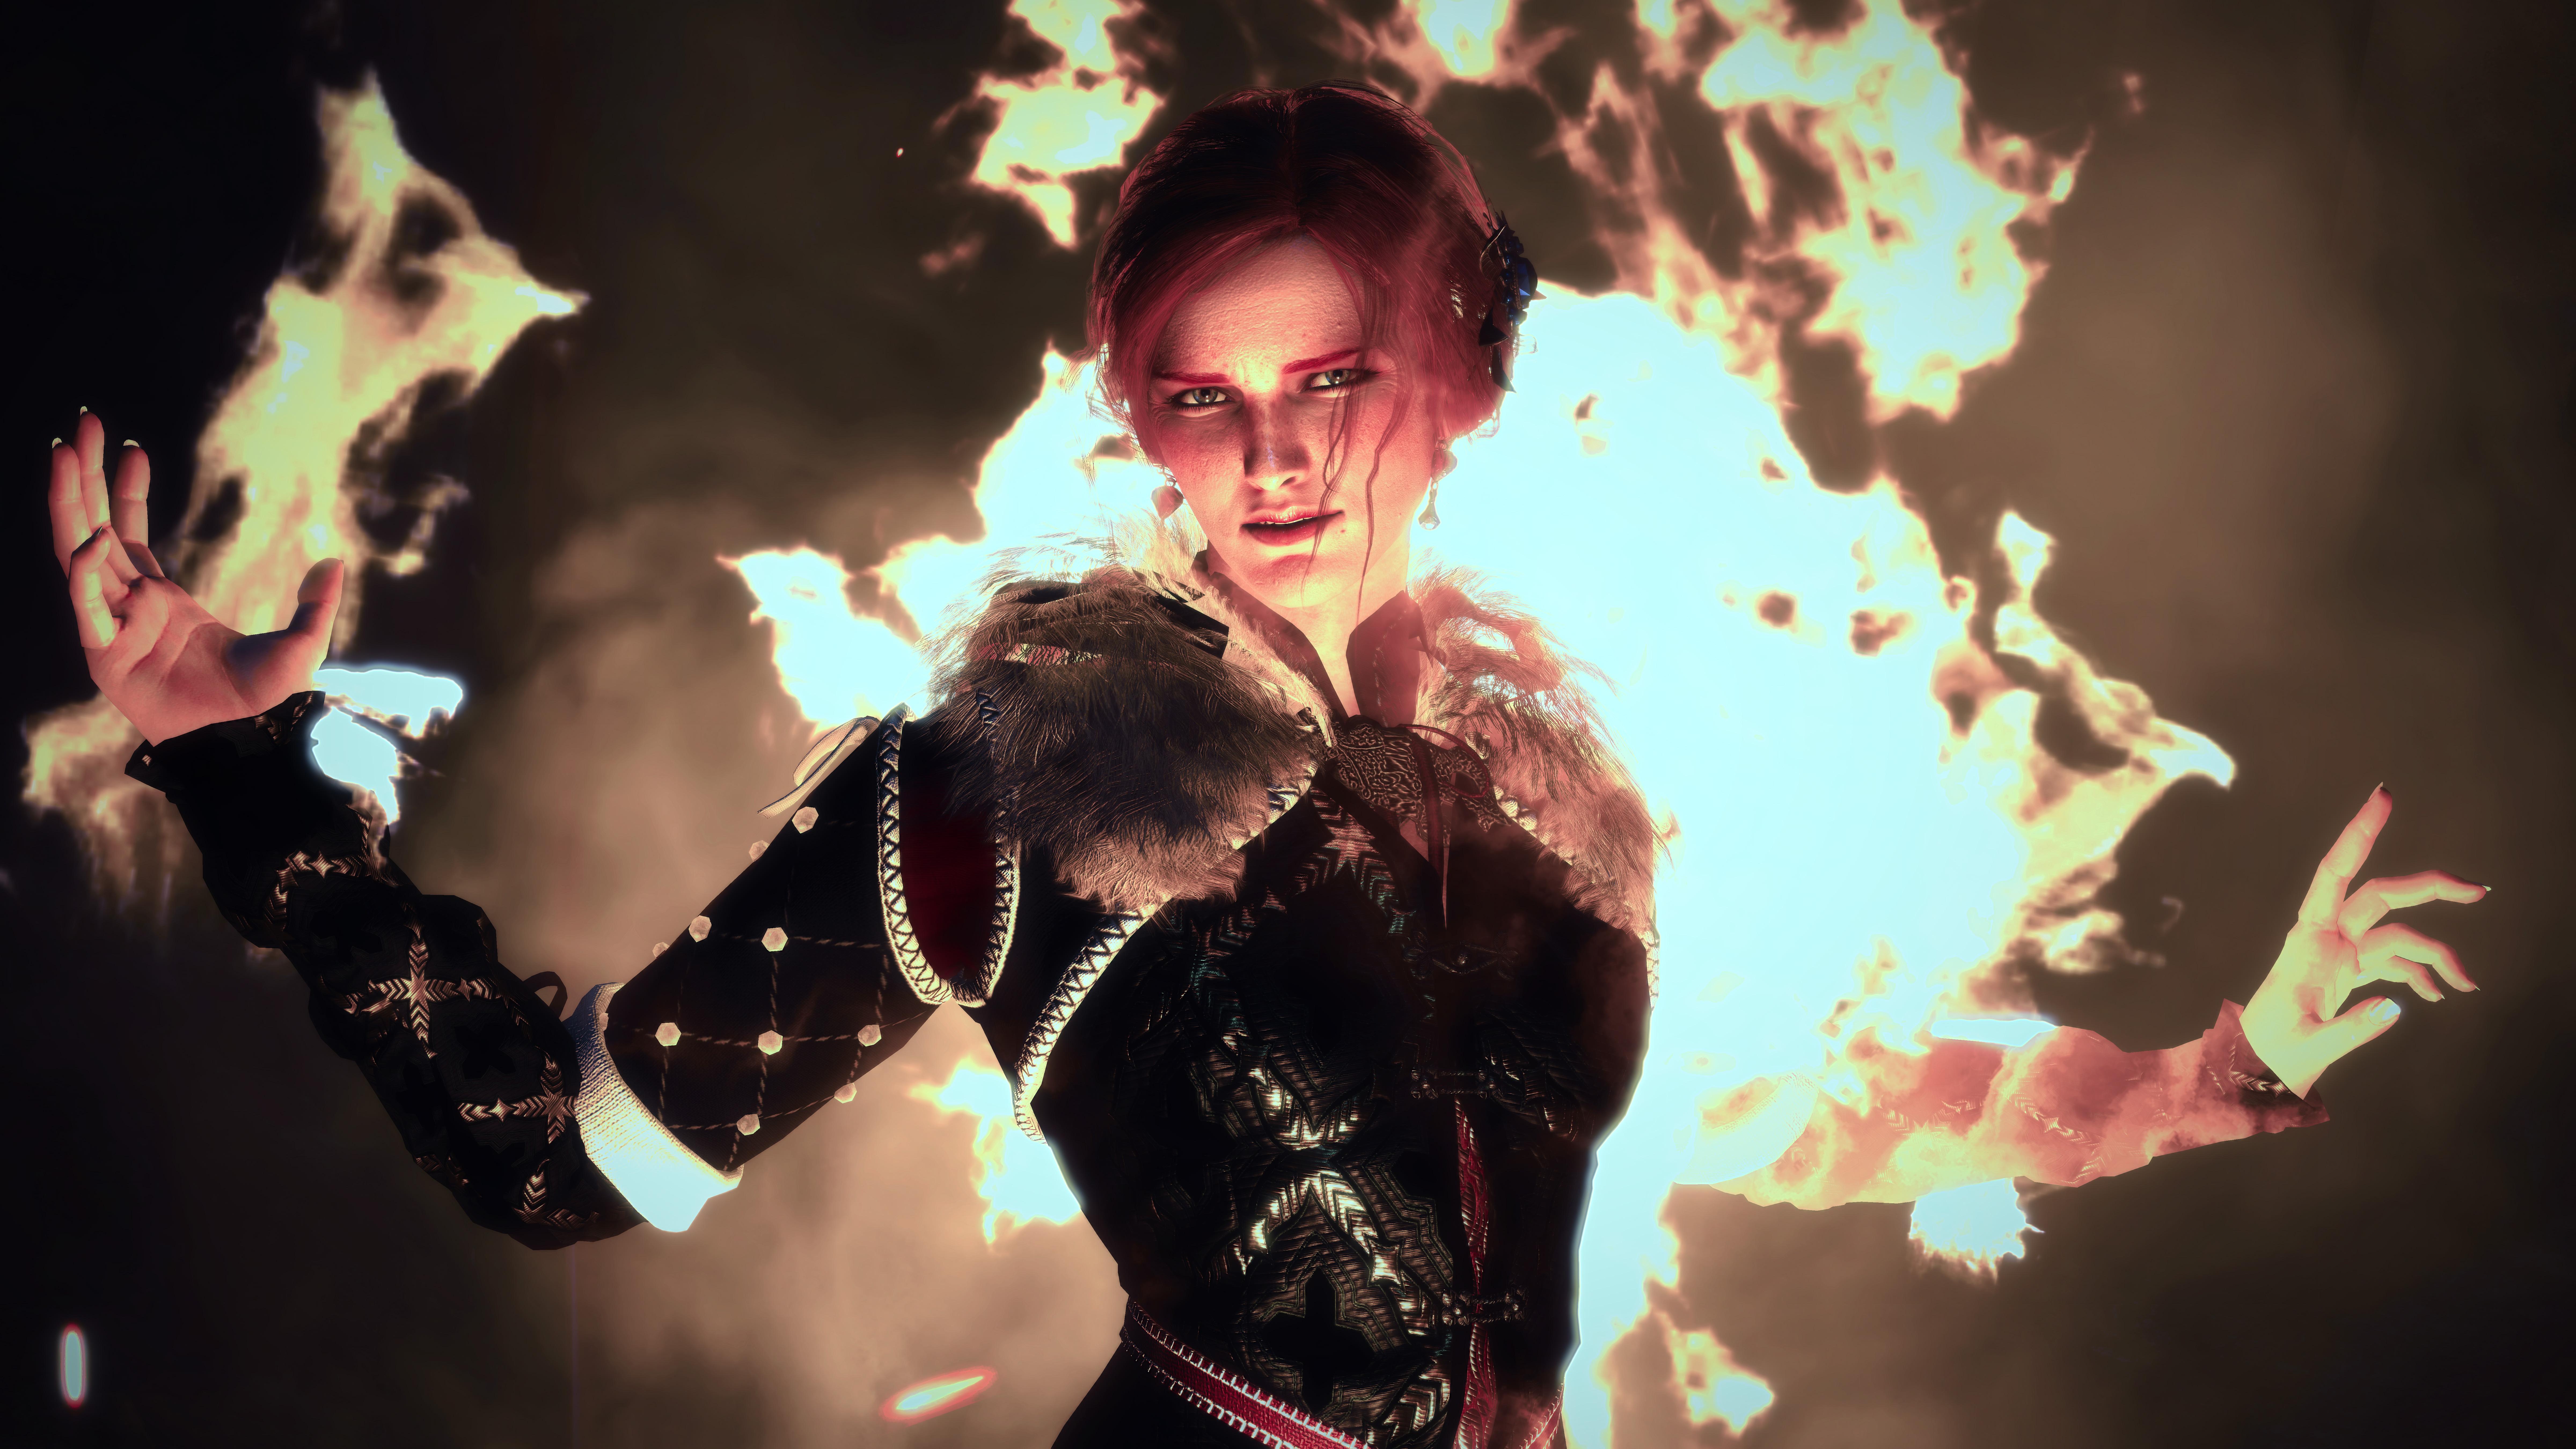 Xbox One X 4k Magic: 2560x1080 The Witcher 3 Magic Woman 10k 2560x1080